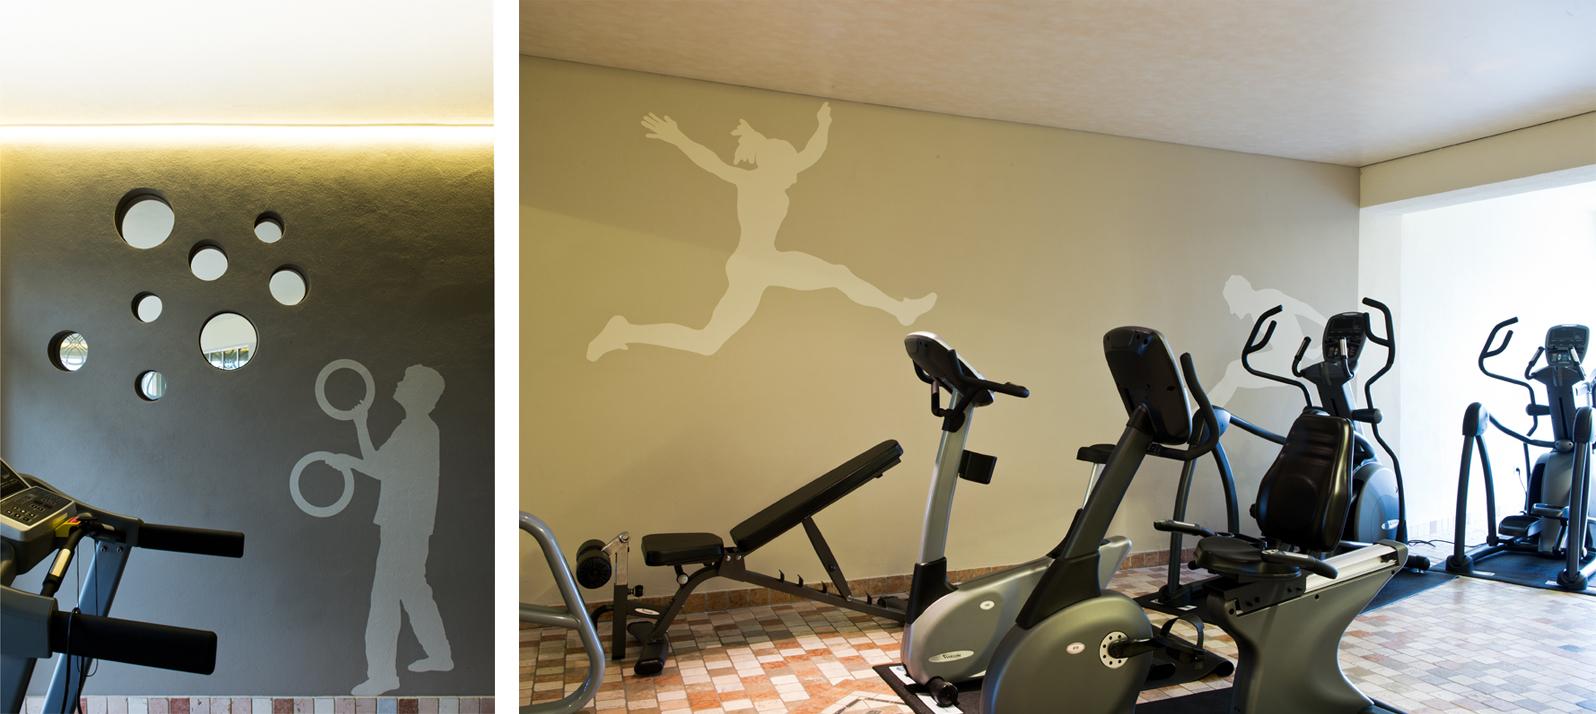 Fitnessraum | palestra